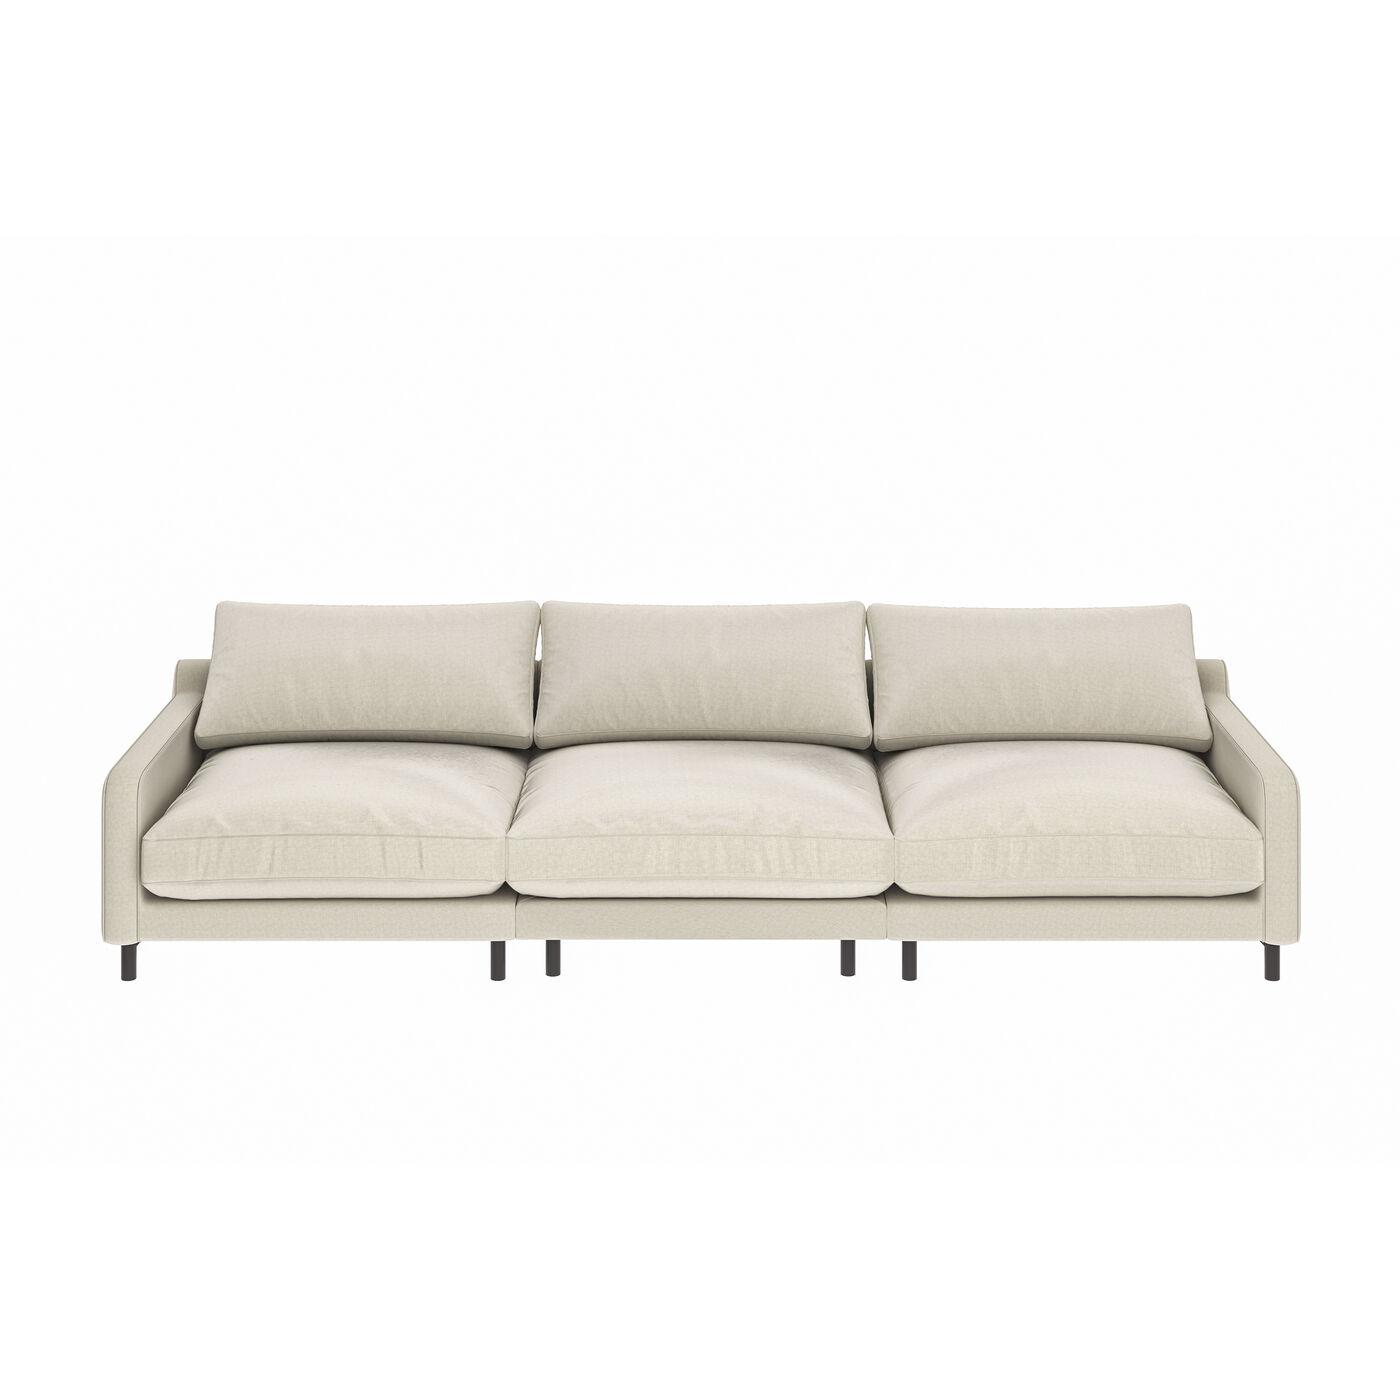 Sofa Discovery 3-Sitzer Creme